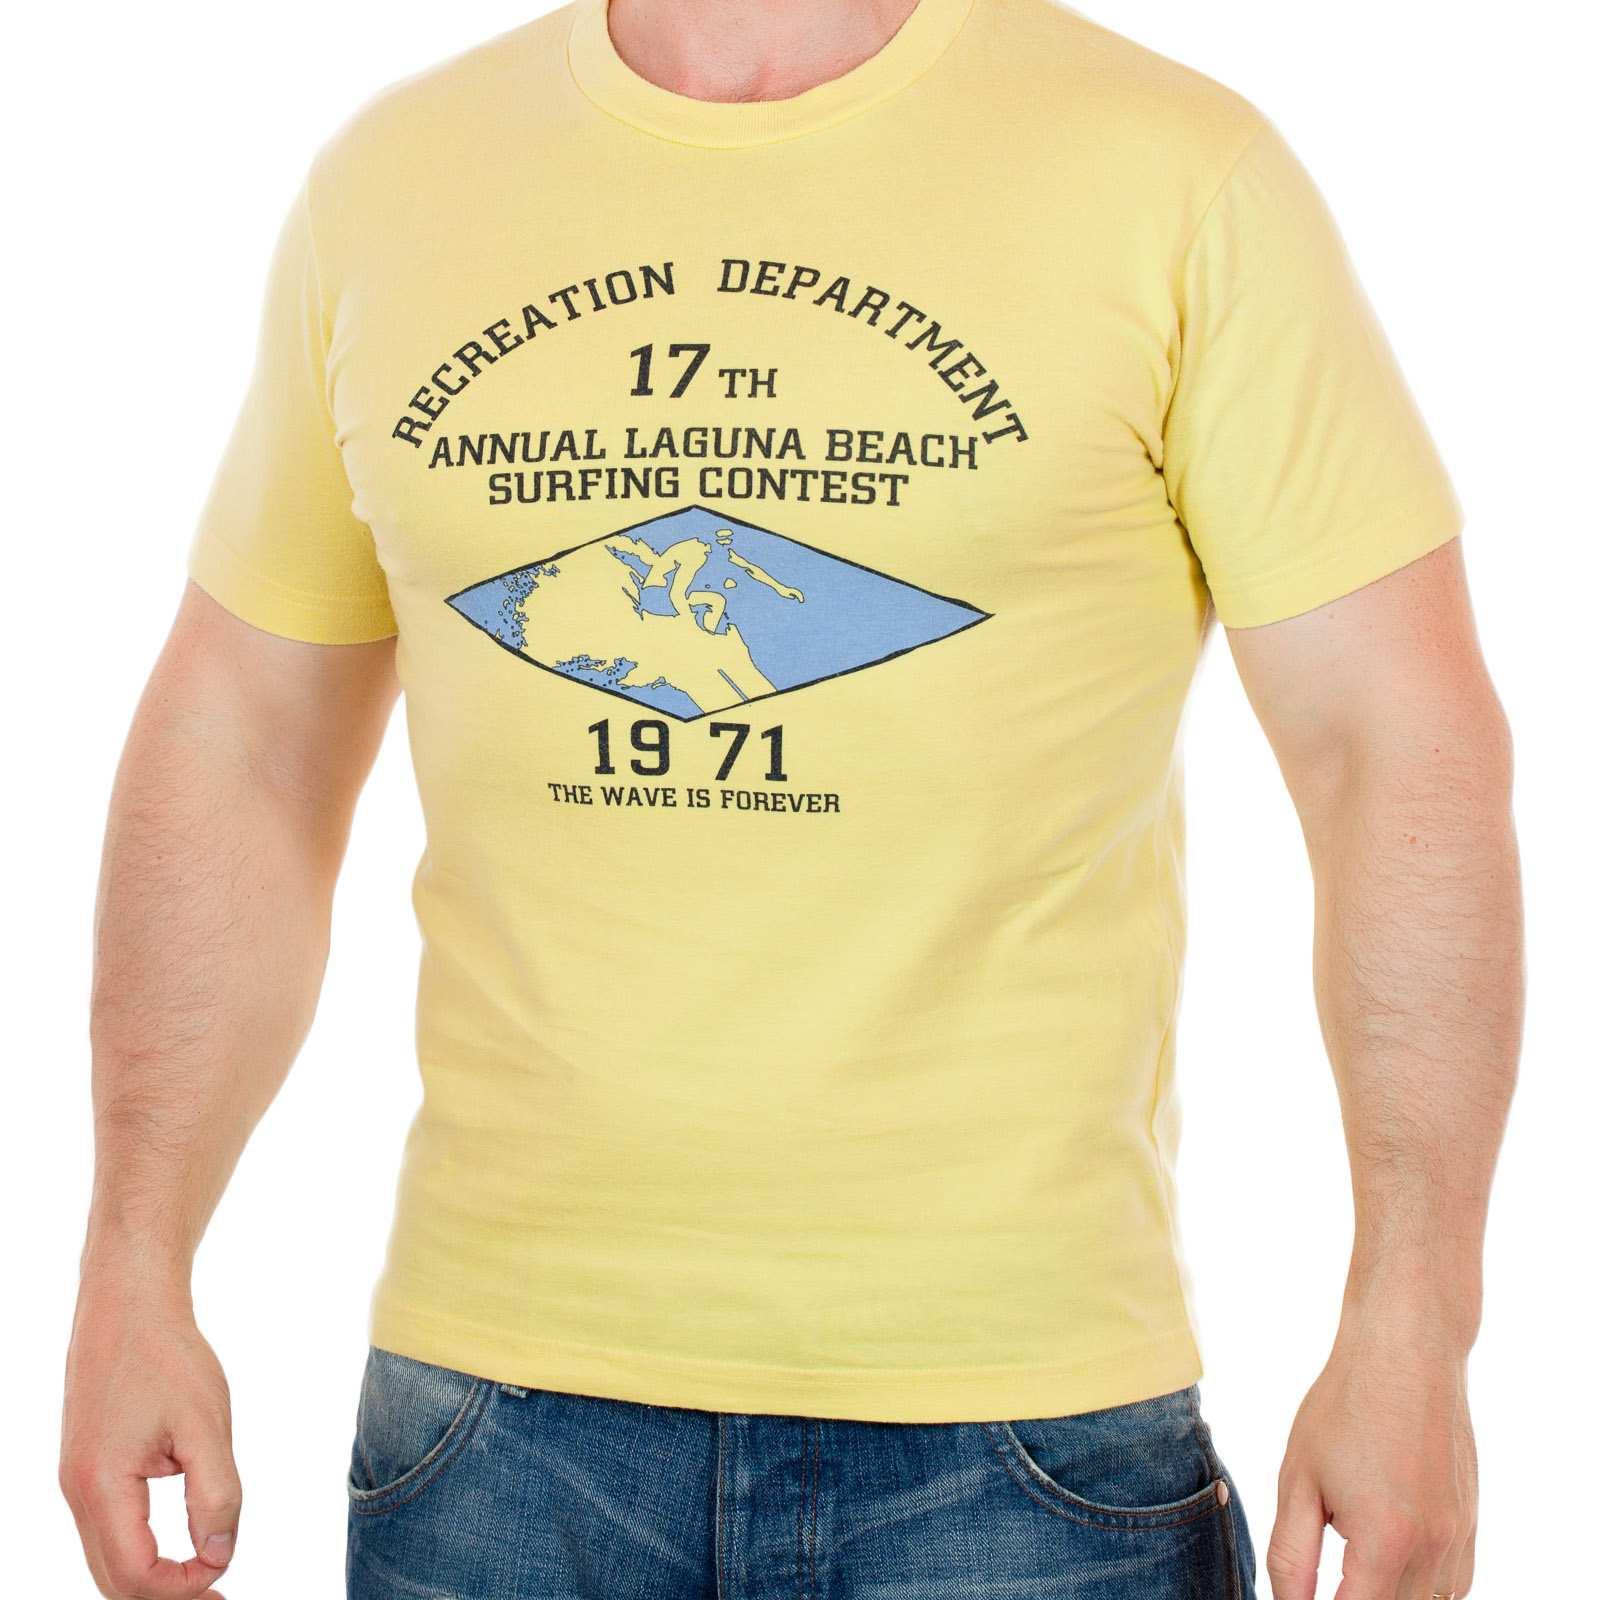 036002714e6 Магазин одежды «Дюна» в Ижевске